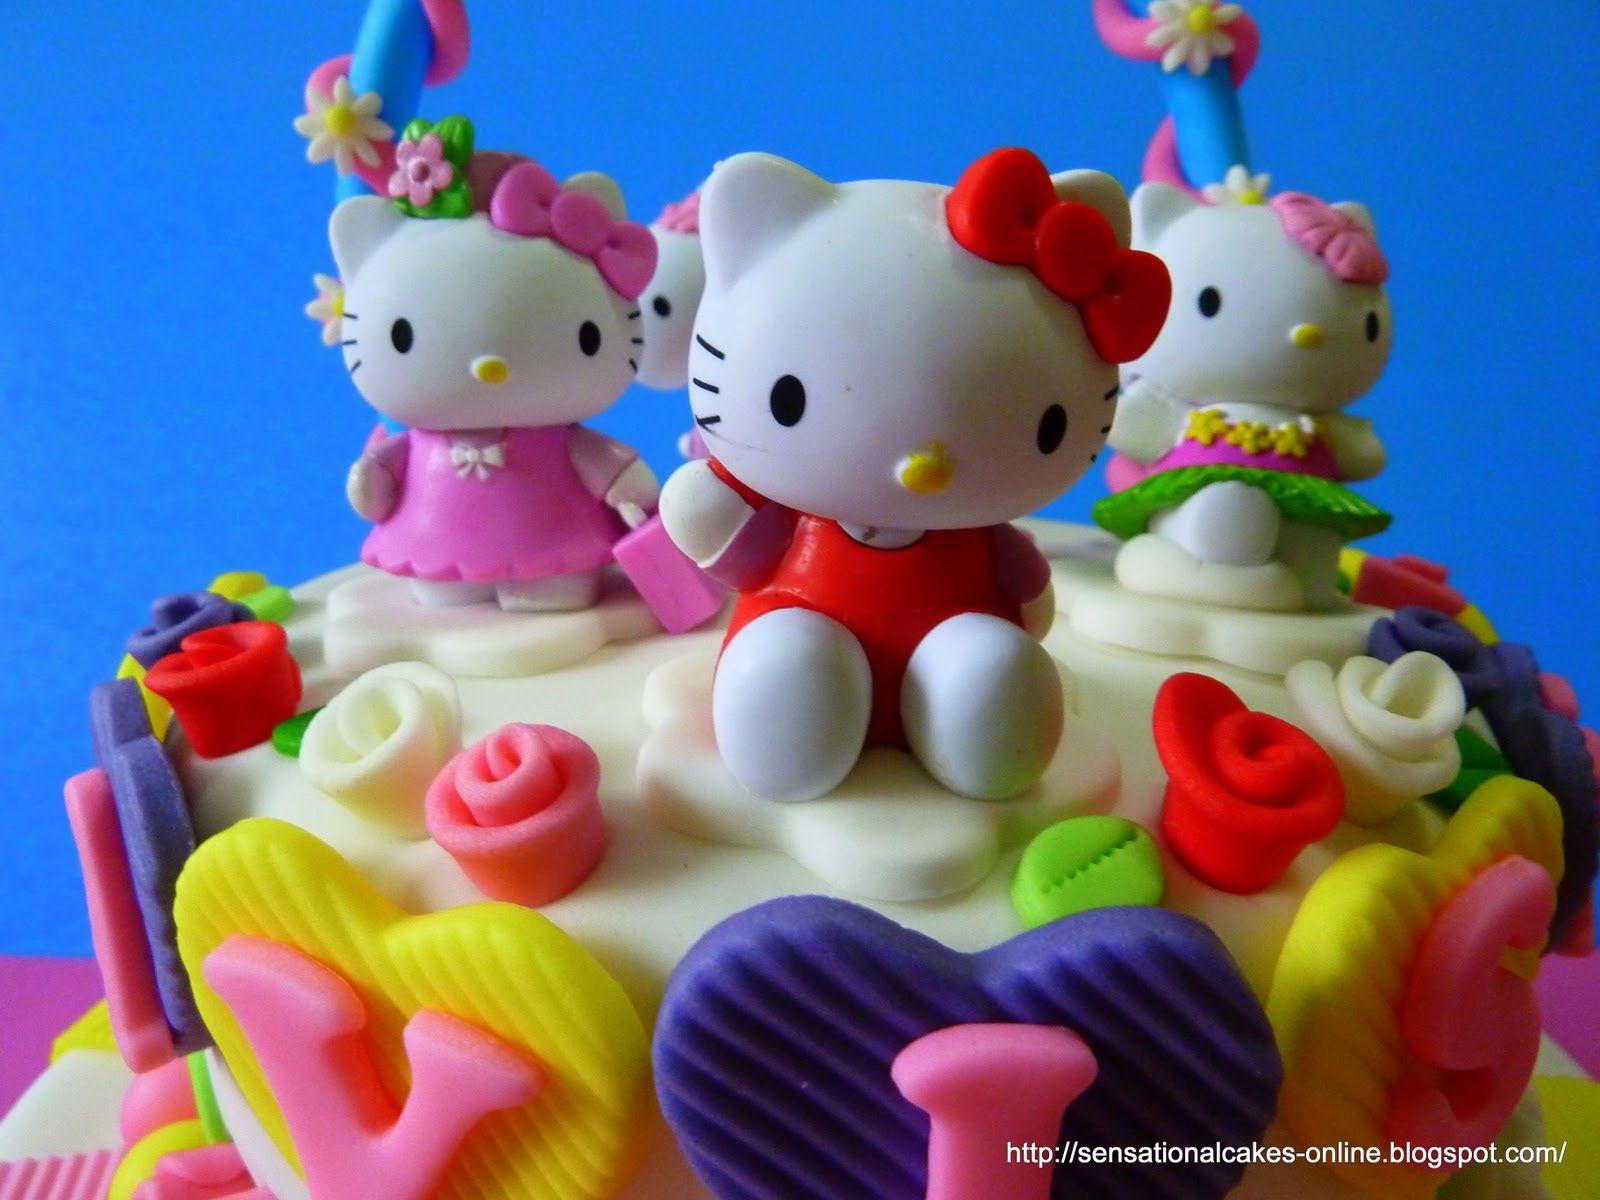 Sensational Cake Singapore Online Cakes Singapore H Kitty